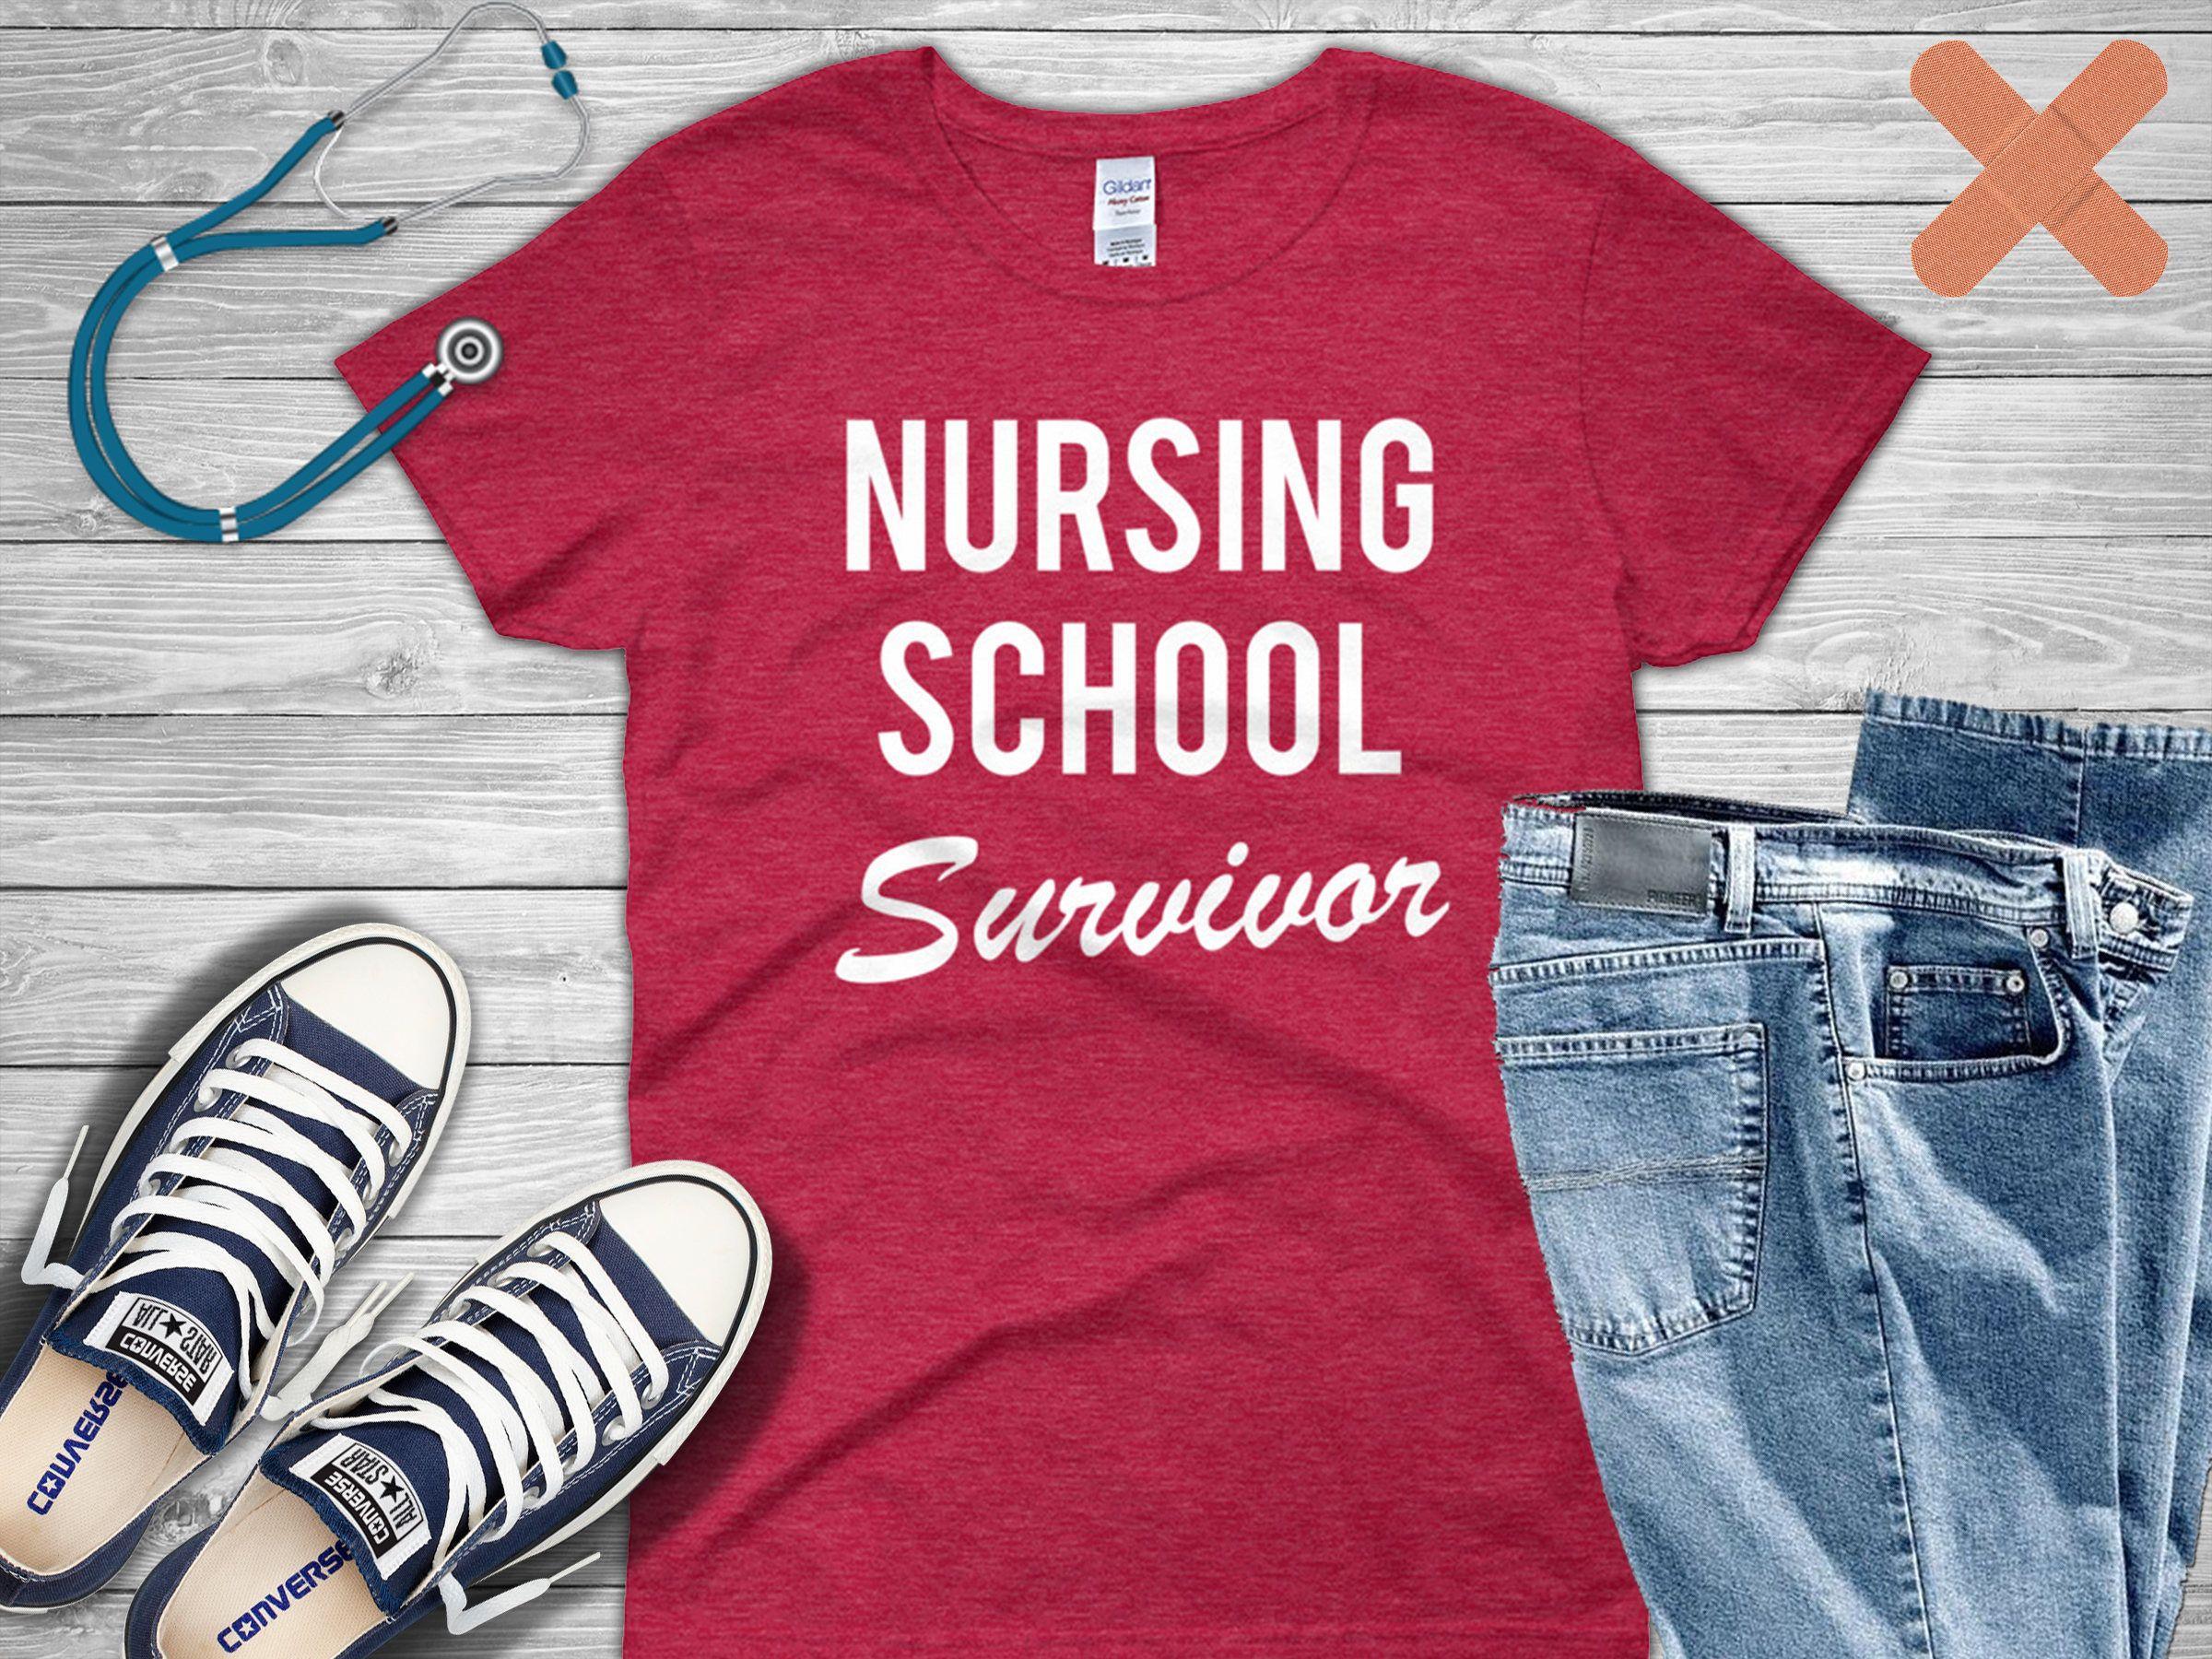 Nurse shirts nurse shirts women night nurse nurse